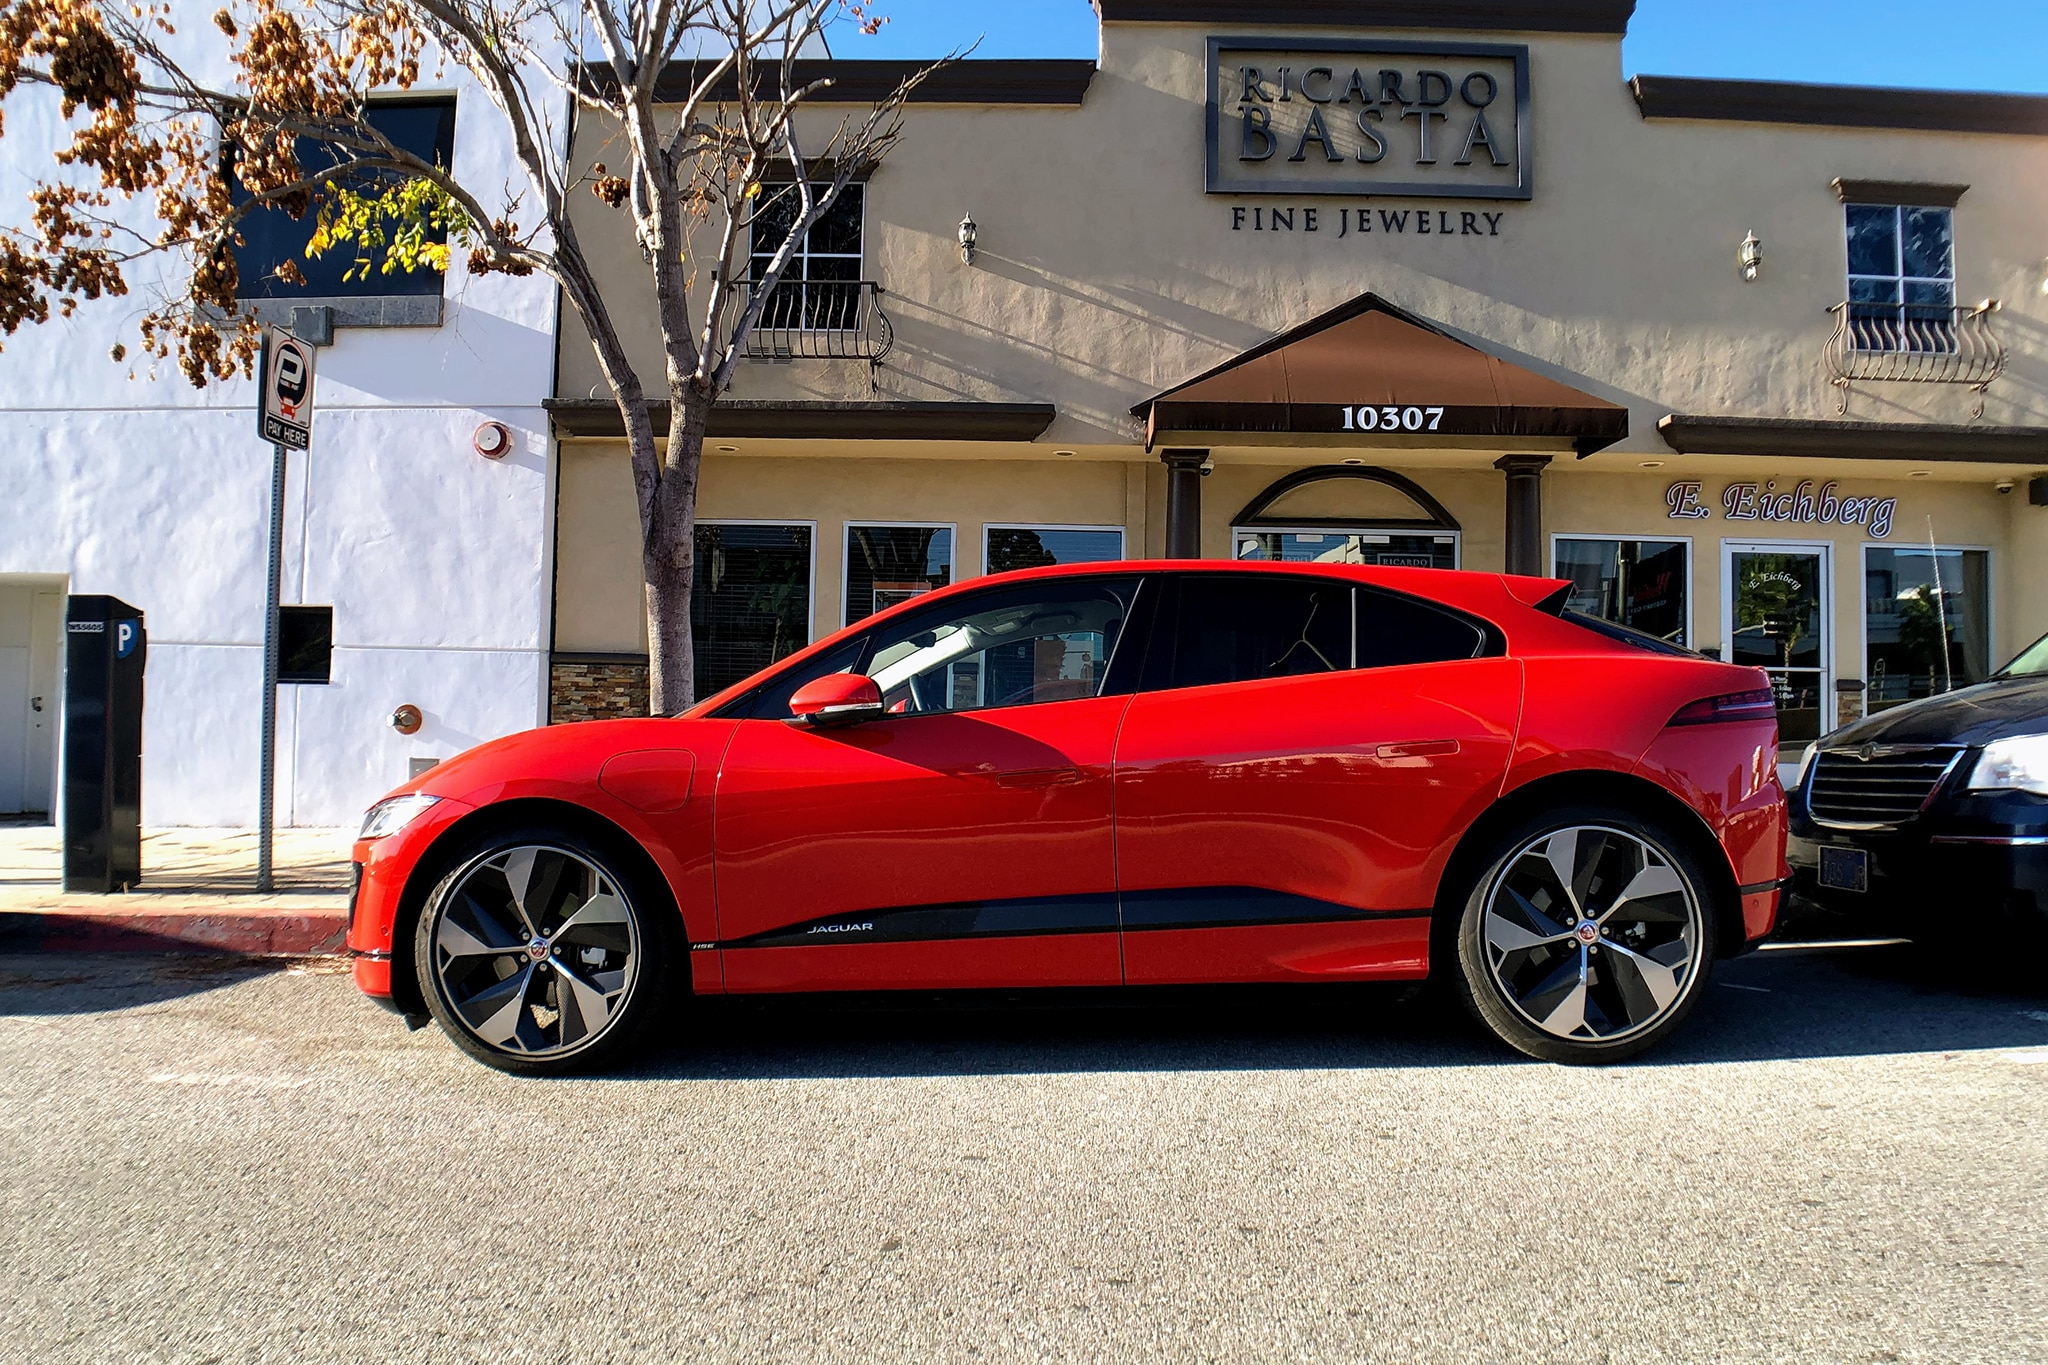 Grand Wagoneer 2018 >> 2019 Jaguar I-Pace Quick-Take Review: No Ordinary Car | Automobile Magazine